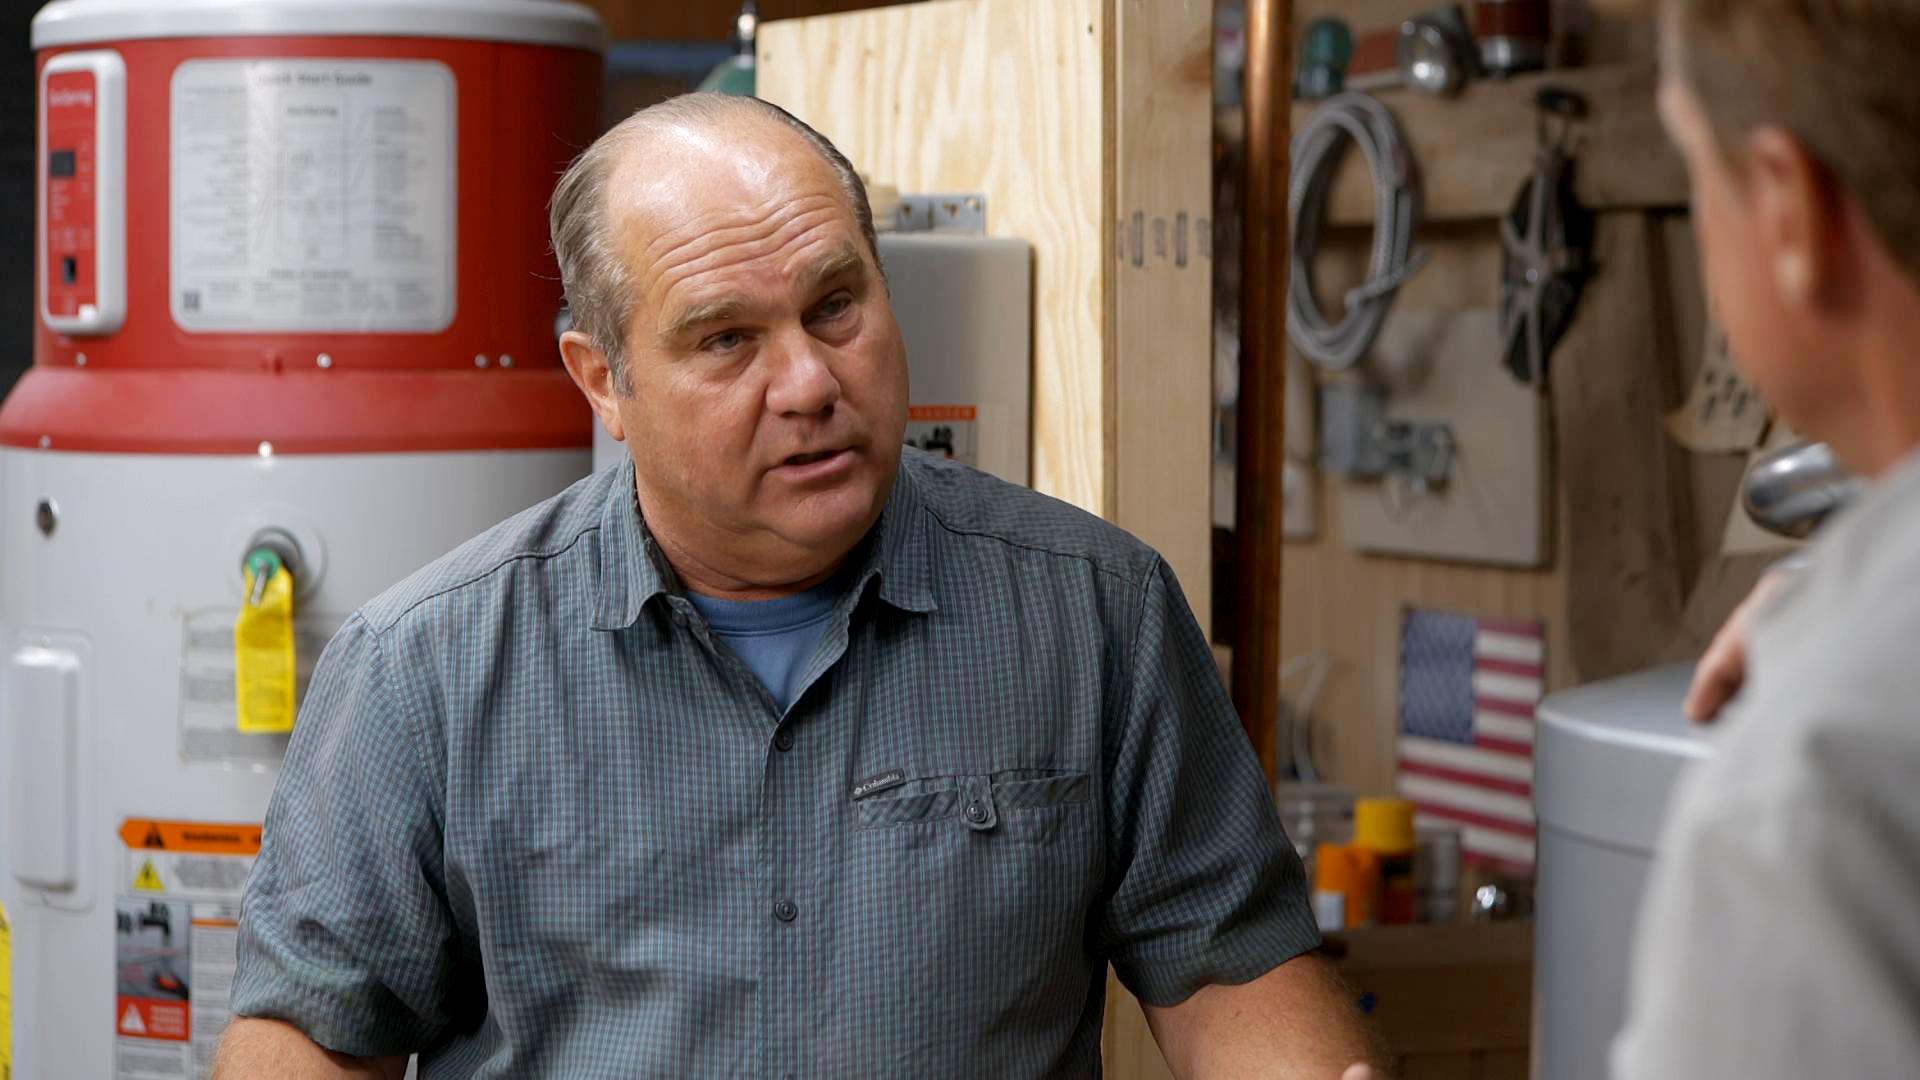 S20 E2, Richard Trethewey explains water heaters